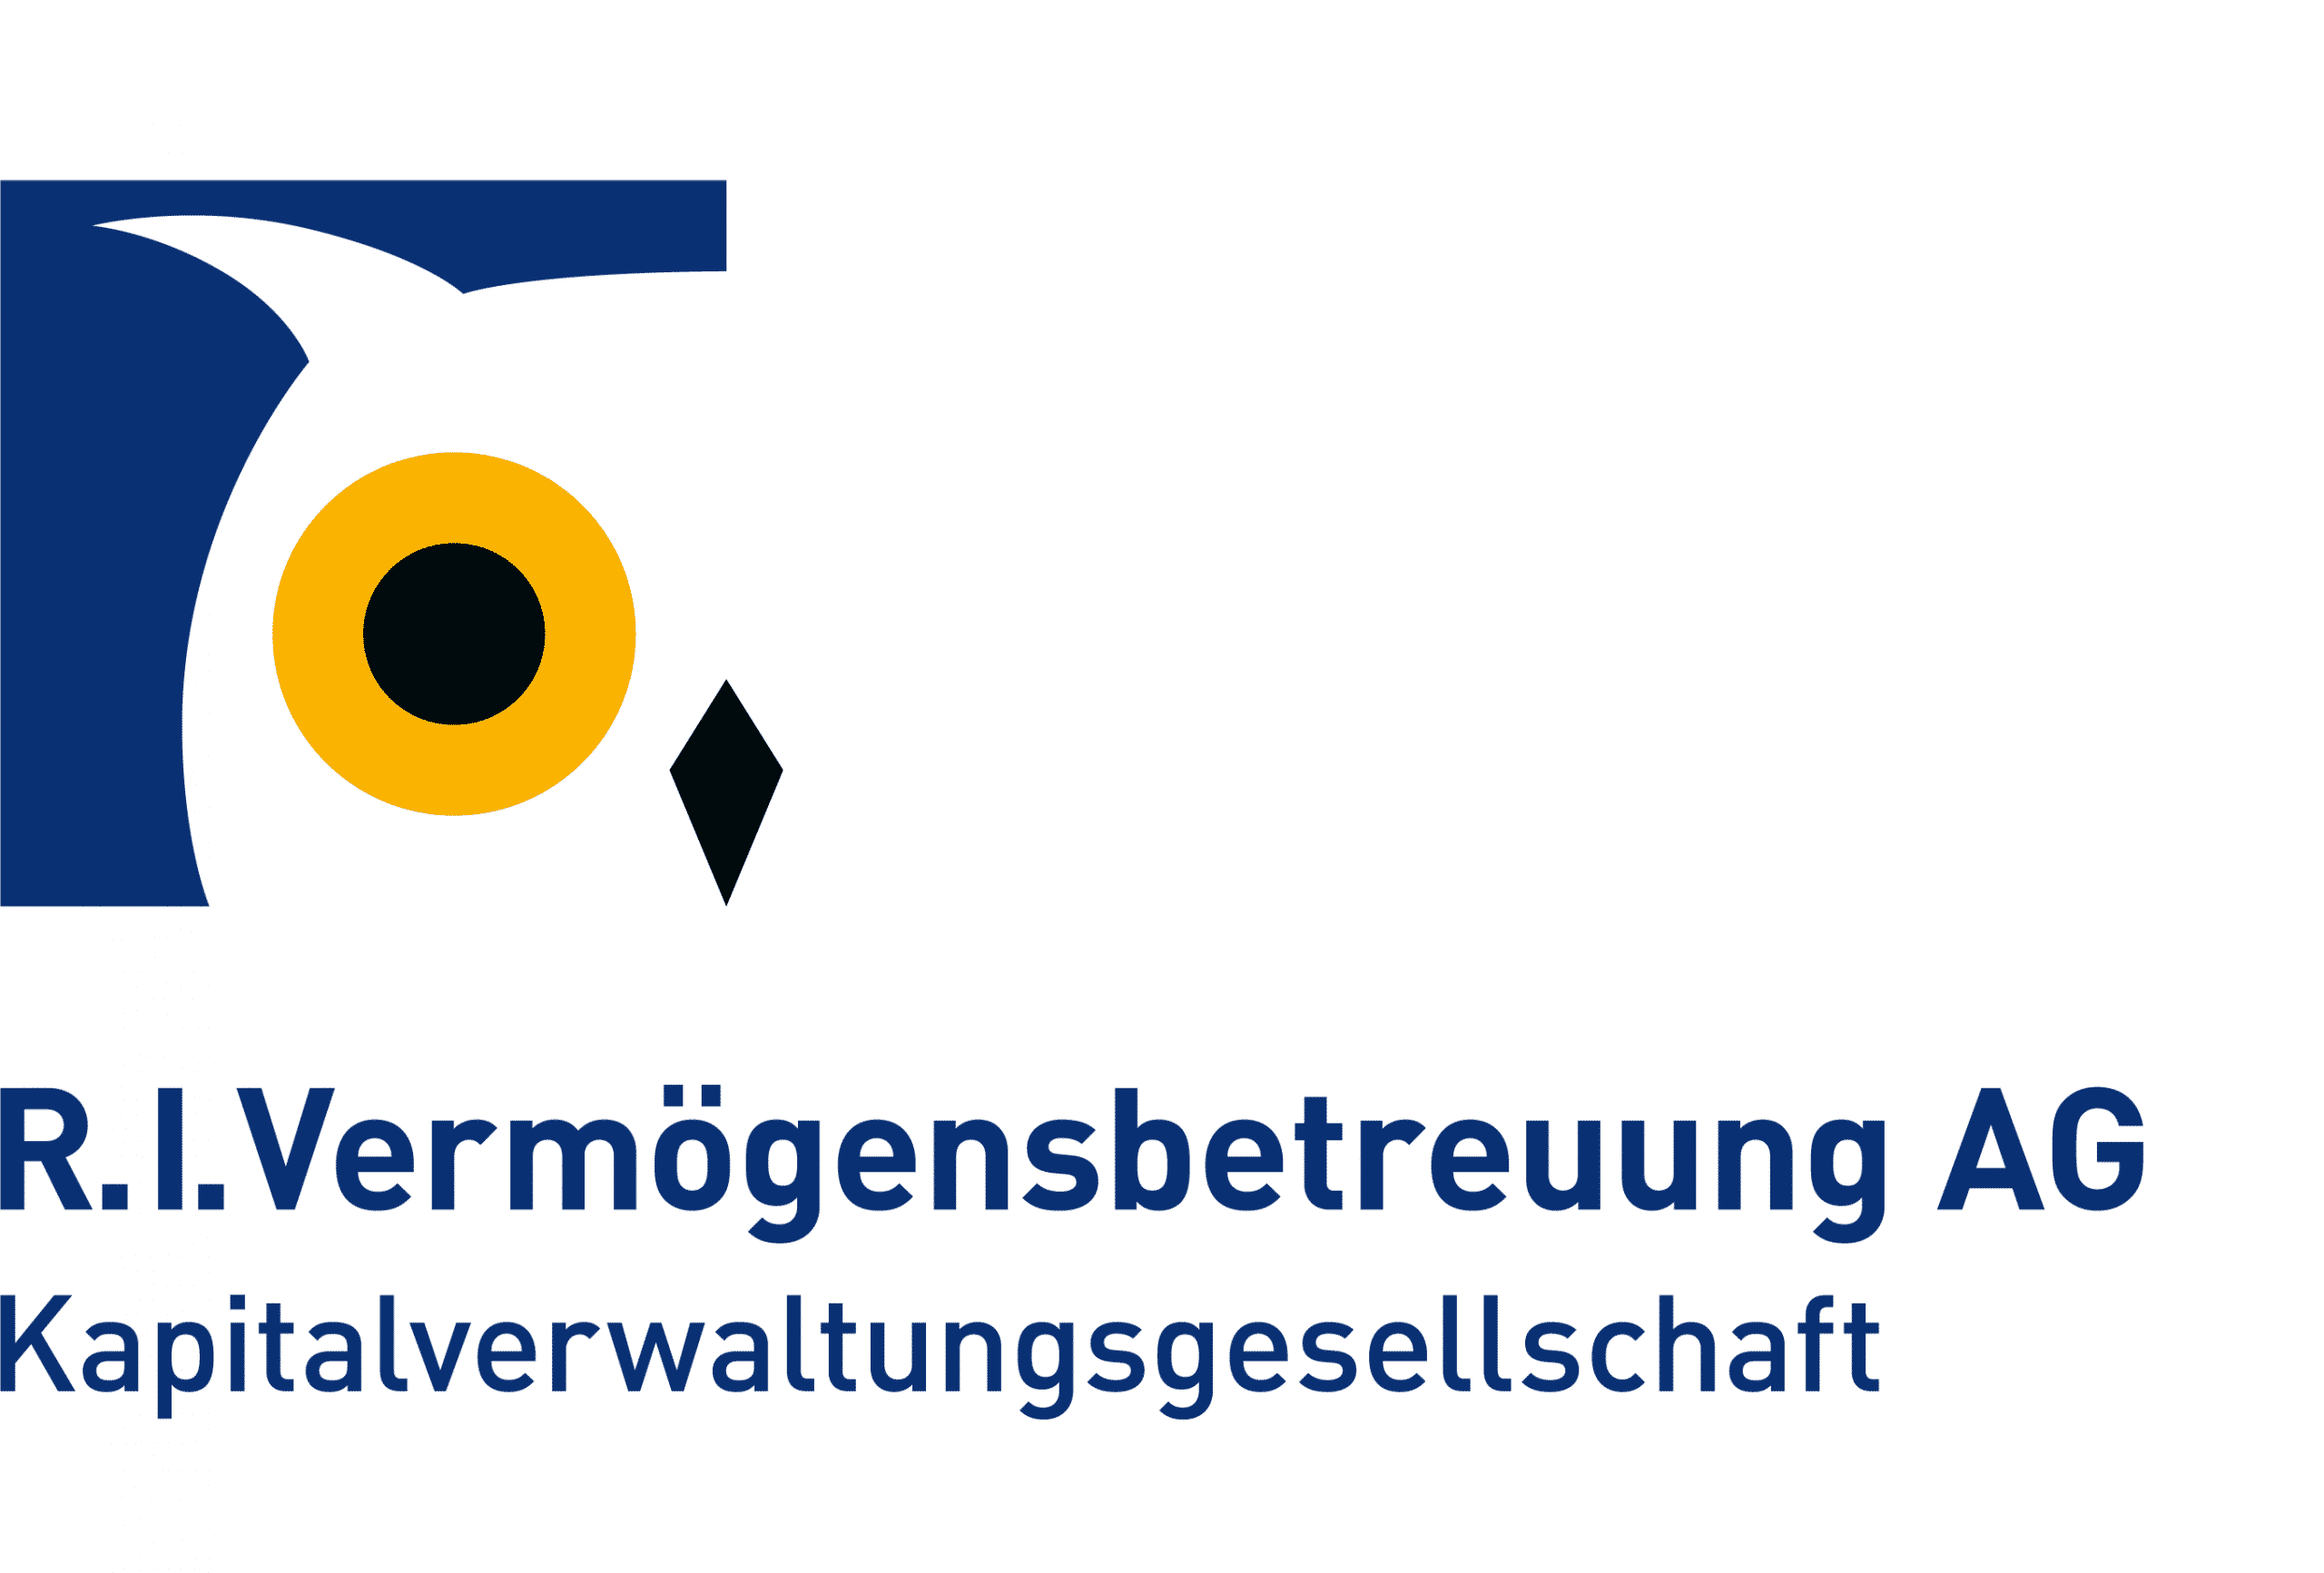 R.I. Vermögensbetreuung AG Logo